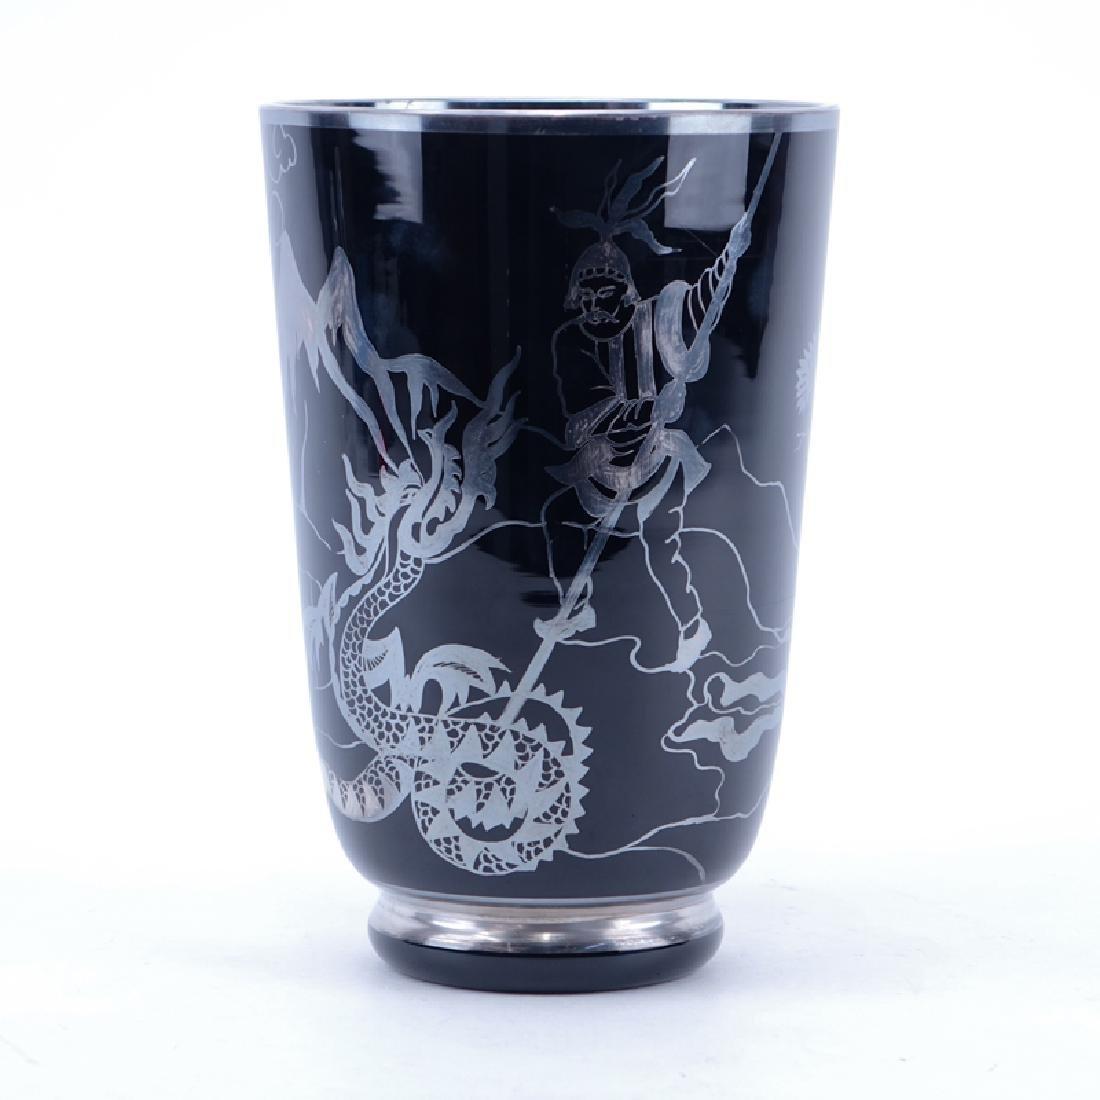 Vintage Décor Main Silver Overlay Amethyst Glass Vase